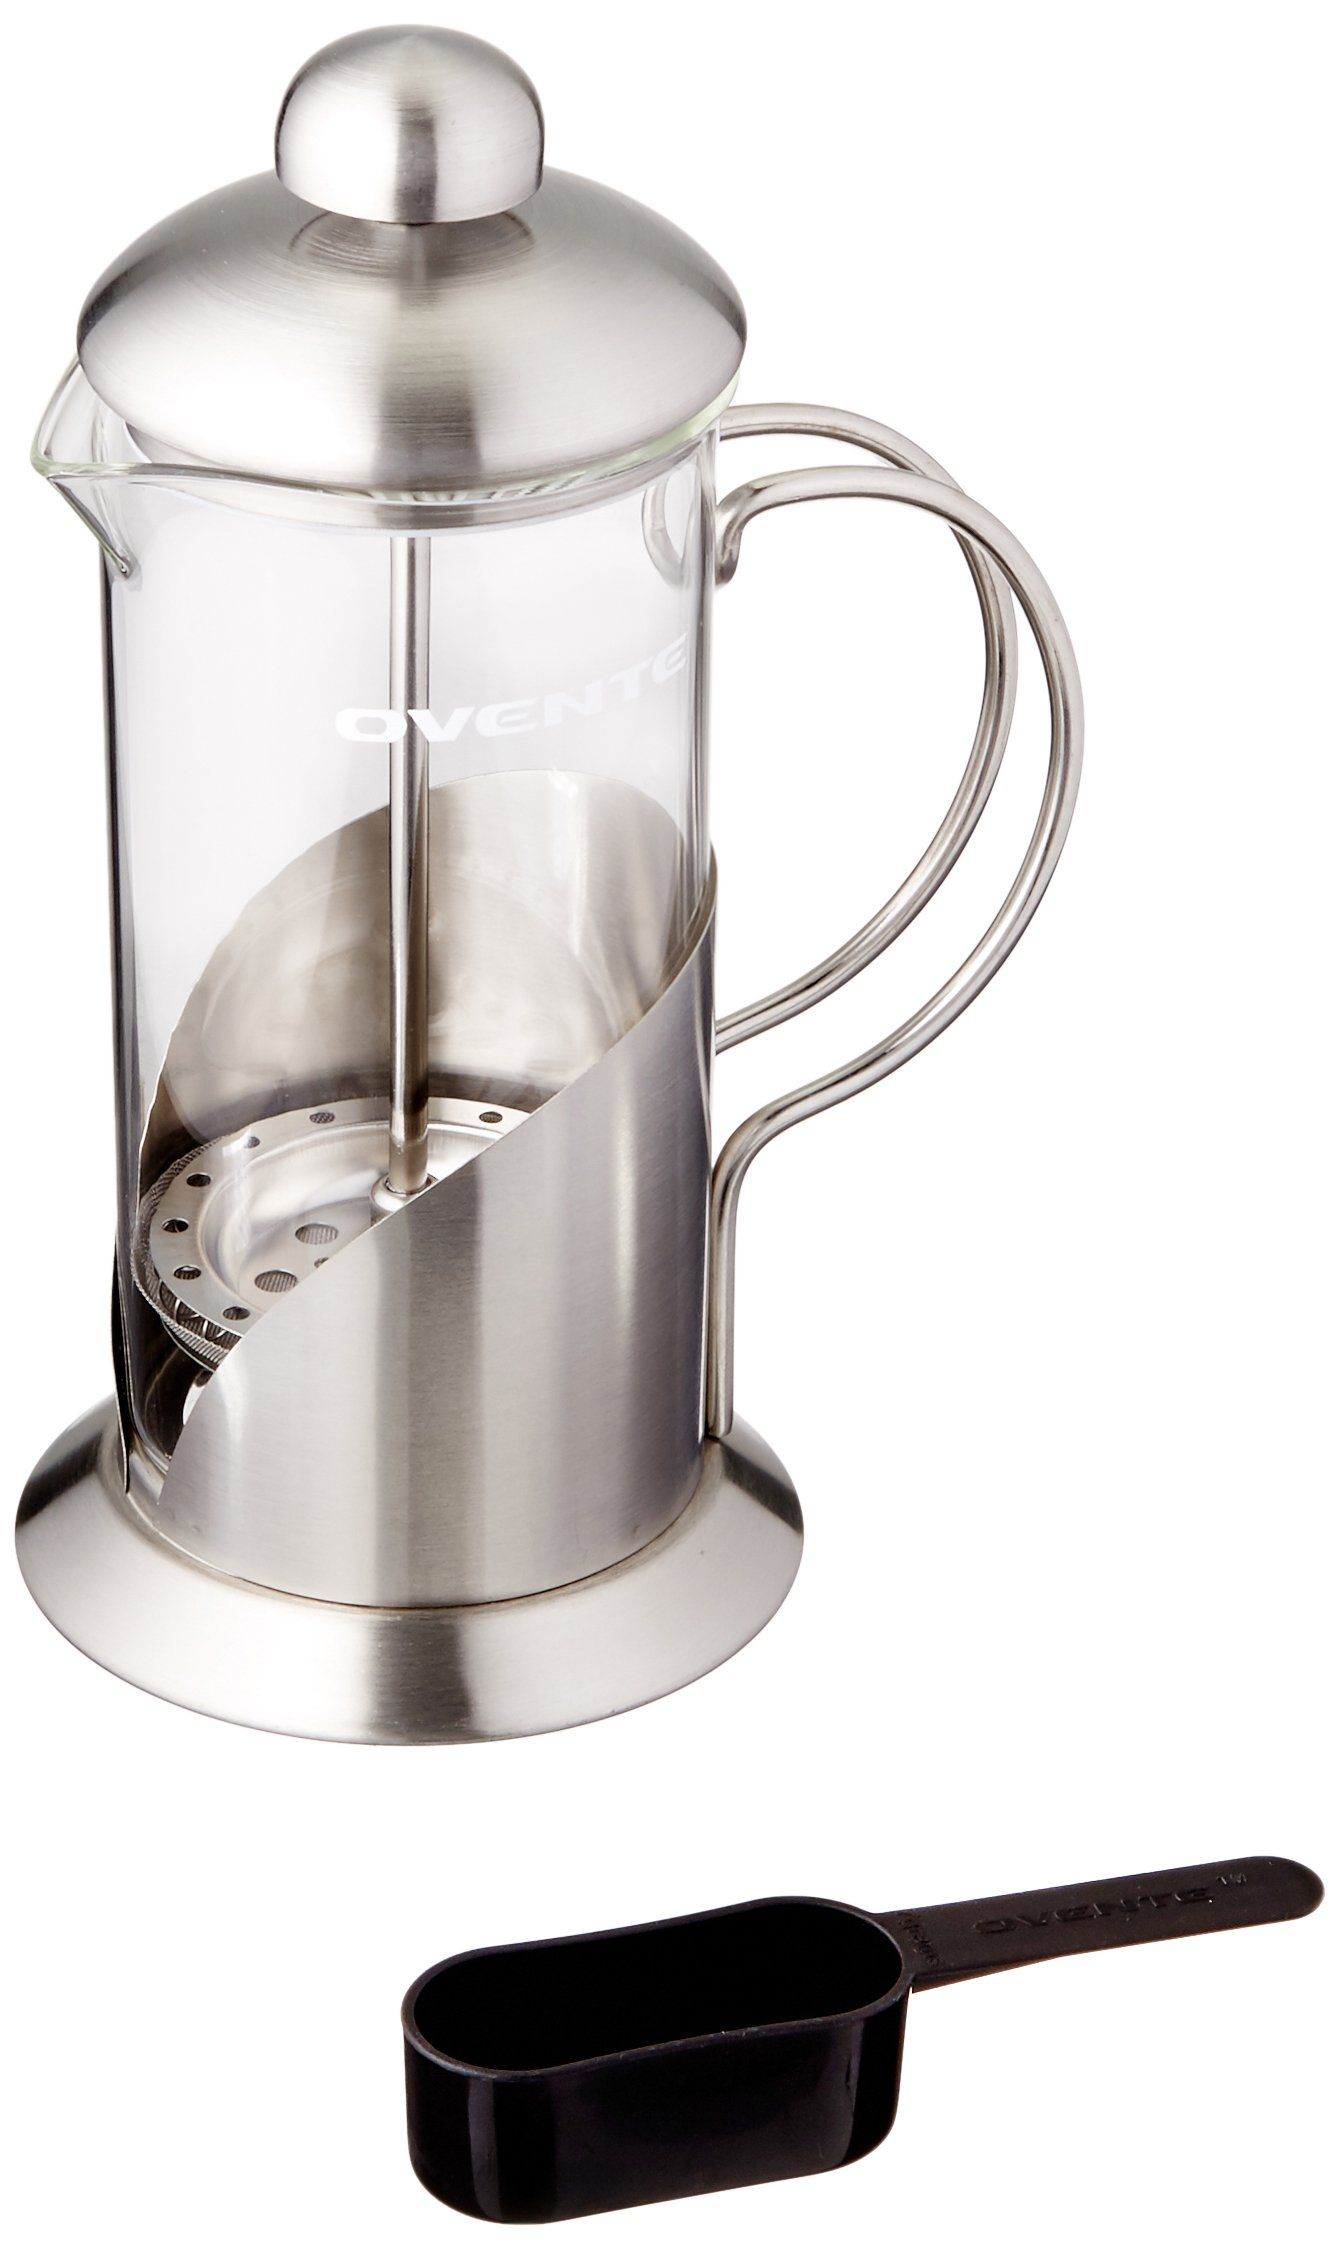 Ovente french press cafetiÃre coffee and tea maker highgrade